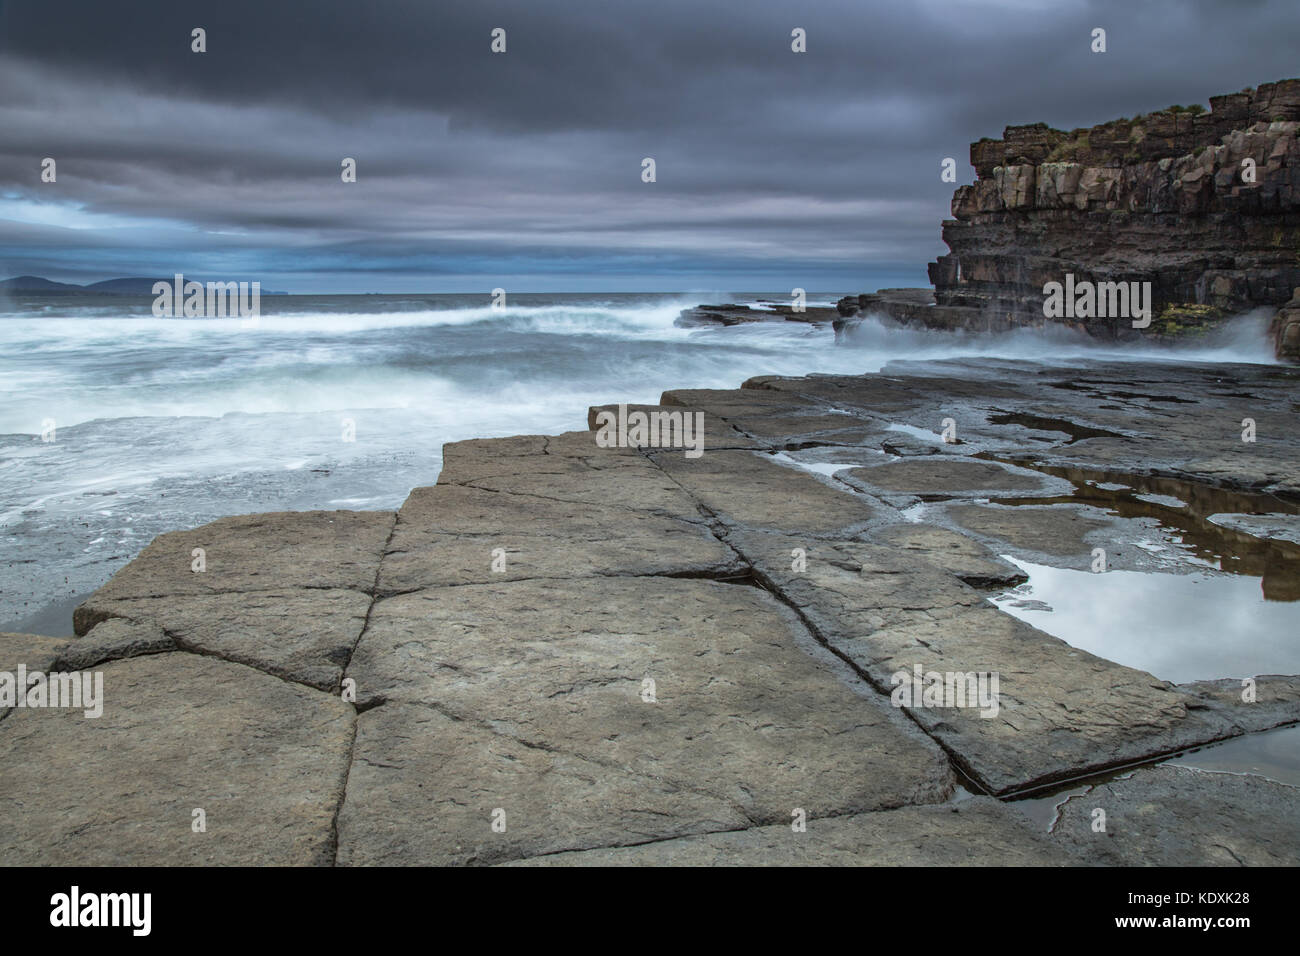 Atlantic Waves crash onto the rocks at Downpatrick Head, Co.Mayo - Stock Image